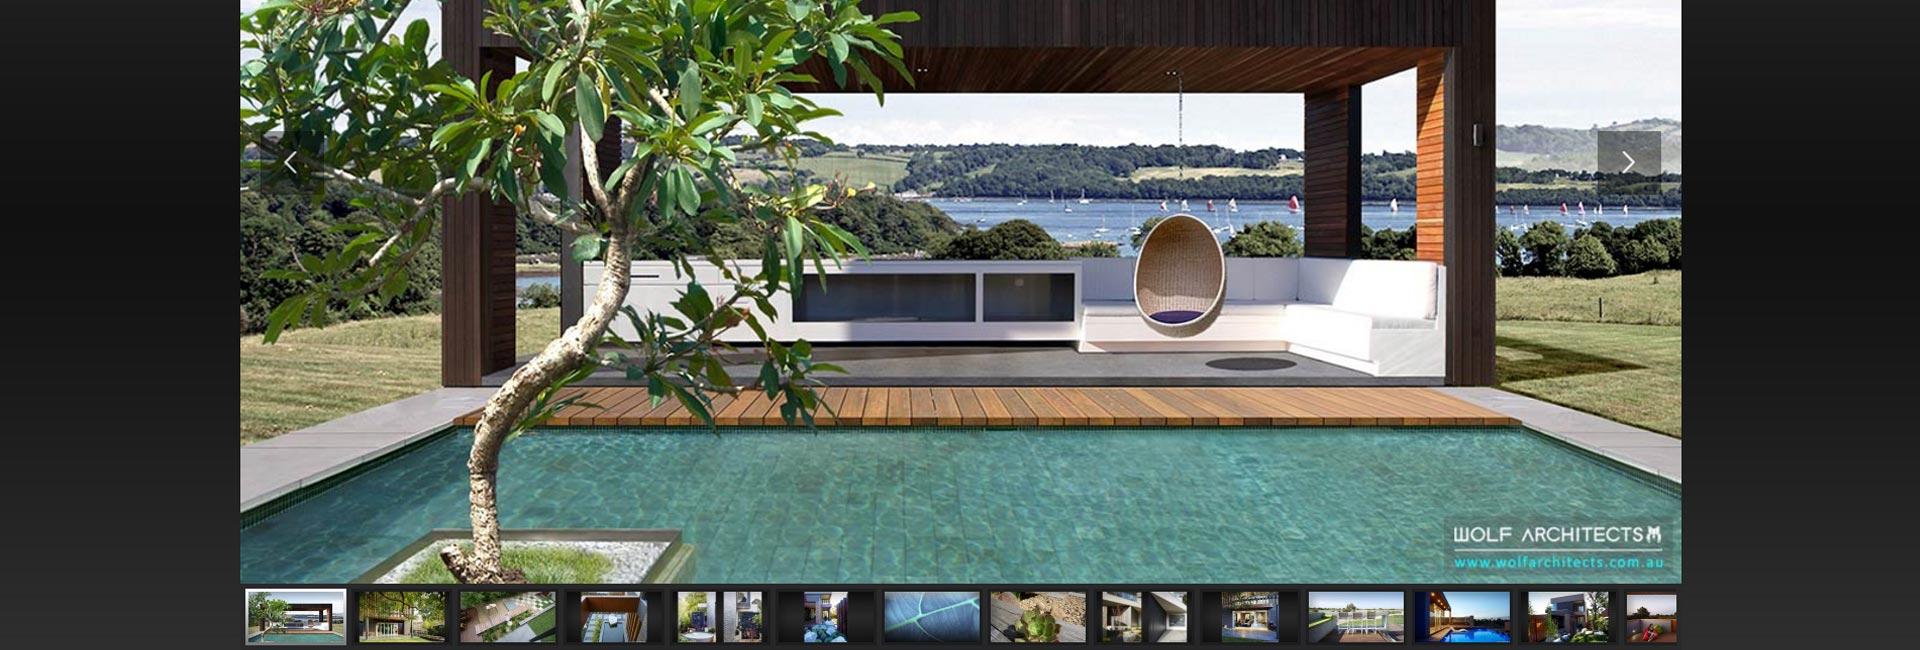 headerslider-melbourne-architects-landscaping